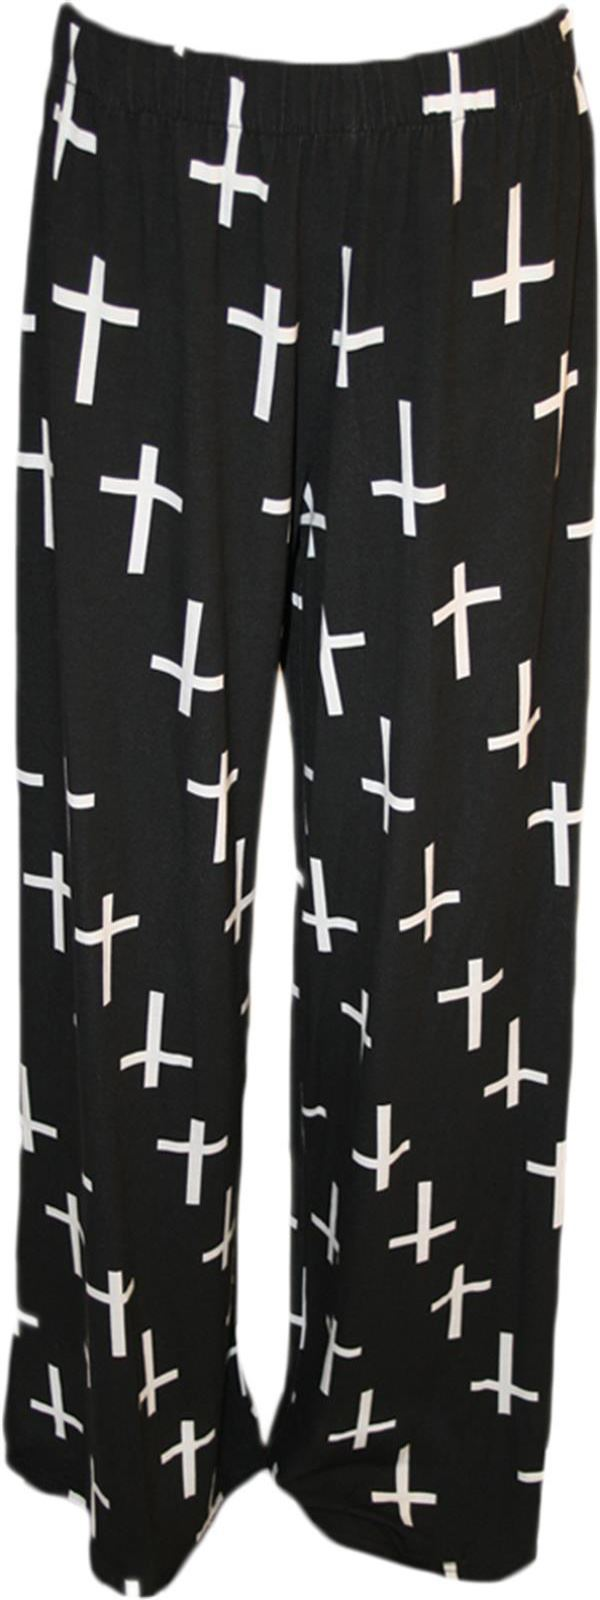 New Womens Plus Size Black Cross Print Legging Harem Palazzos 8-26